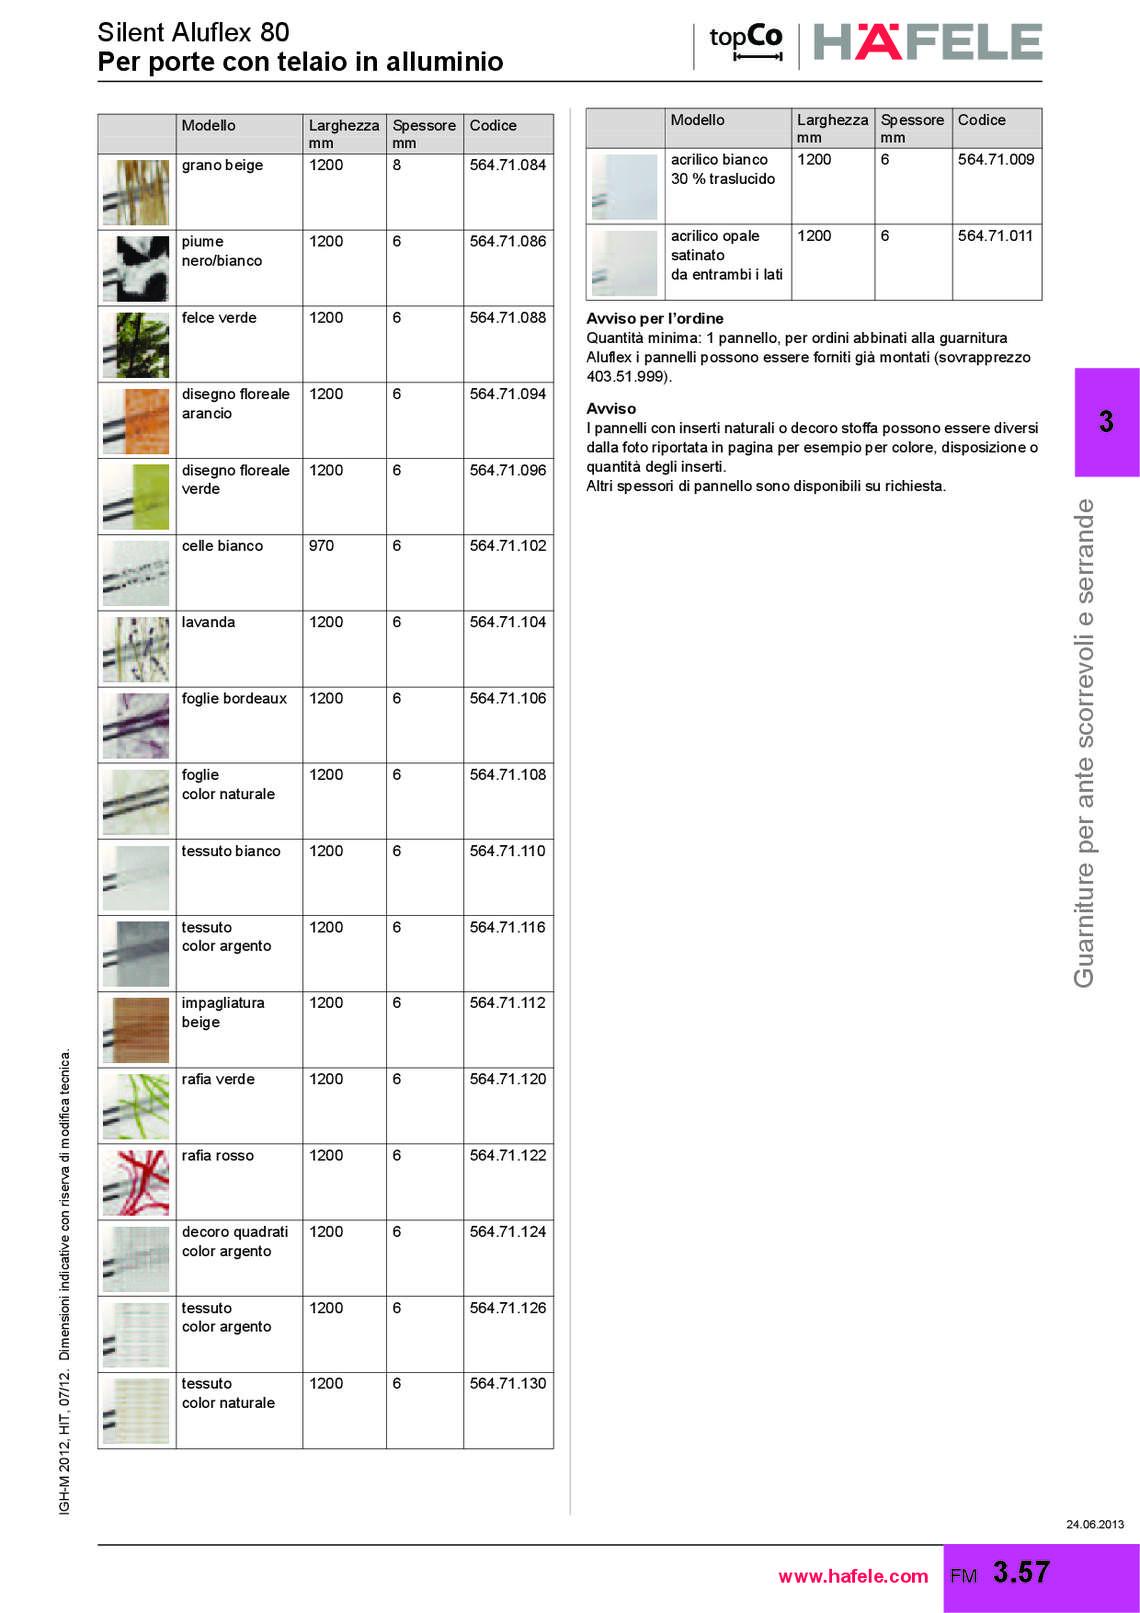 hafele-prodotti-su-misura_81_072.jpg